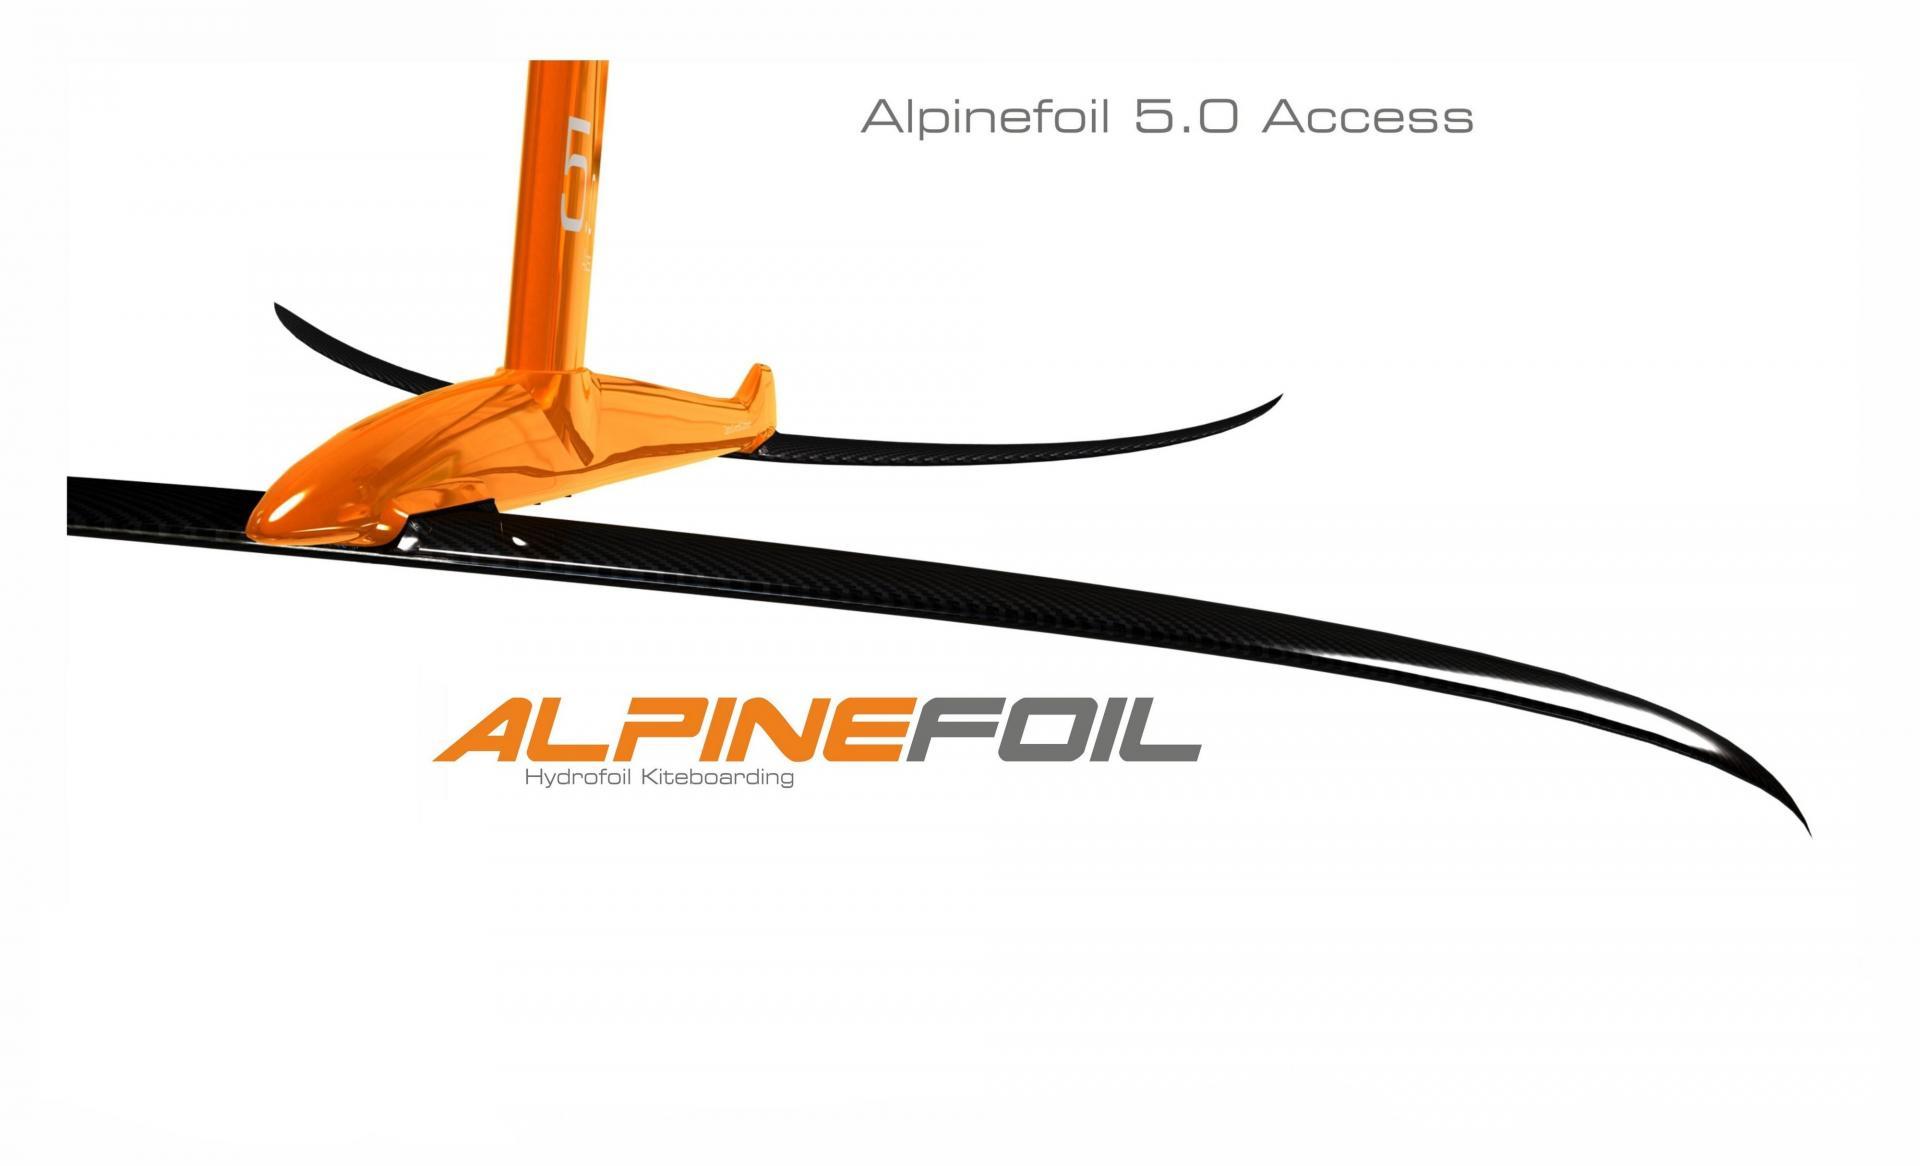 New Kitefoil Alpinefoil 5.0 Access